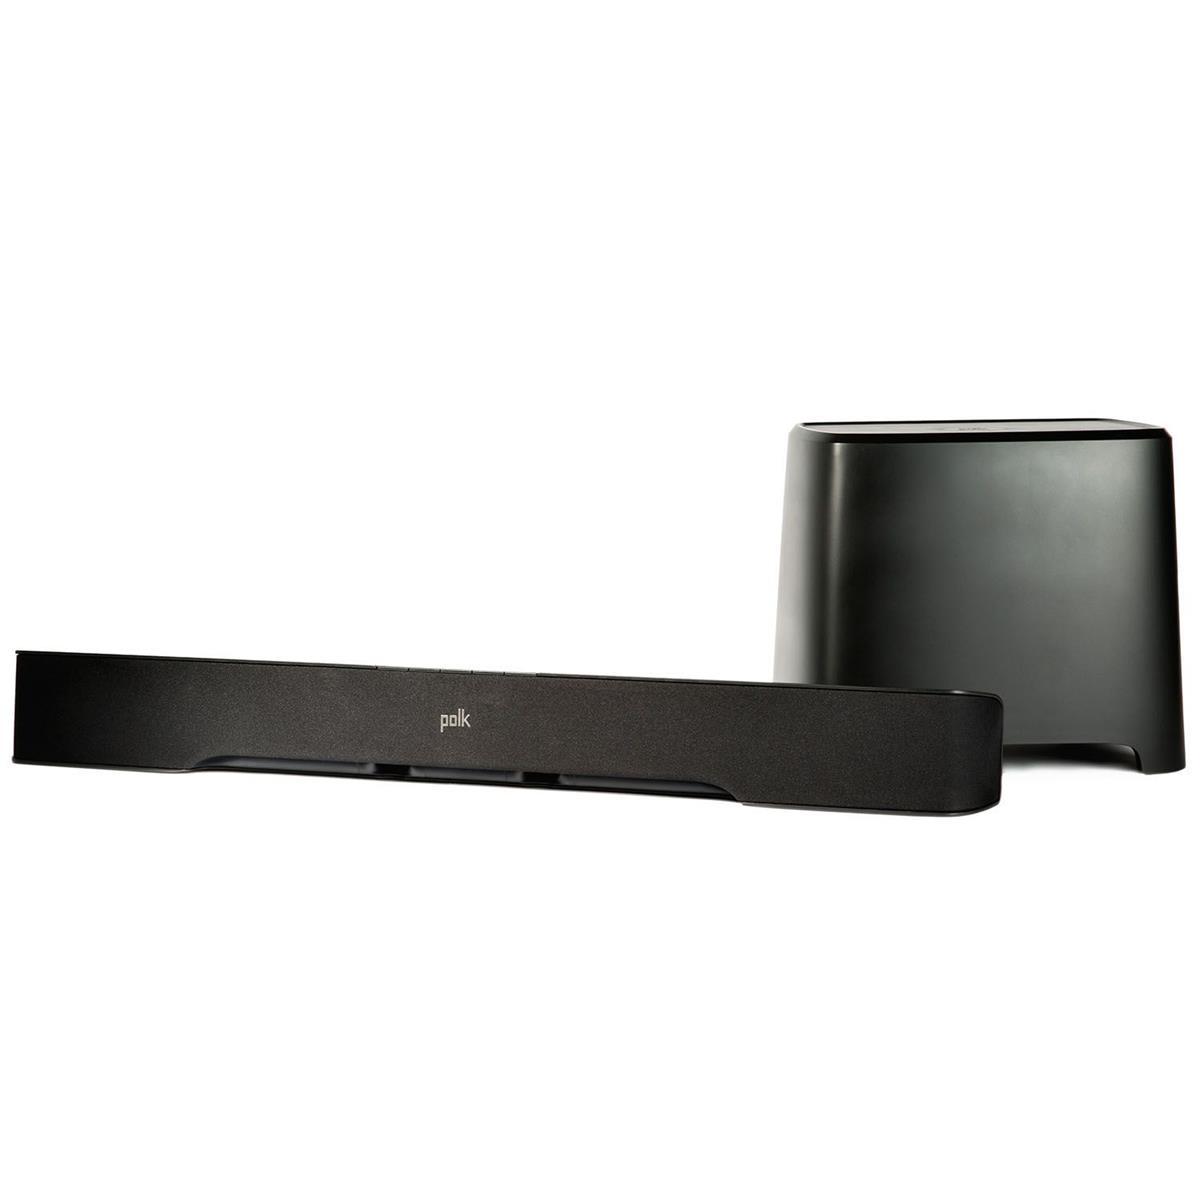 240w Polk Audio Universal Soundbar w/ Bluetooth Subwoofer $175 + free shipping